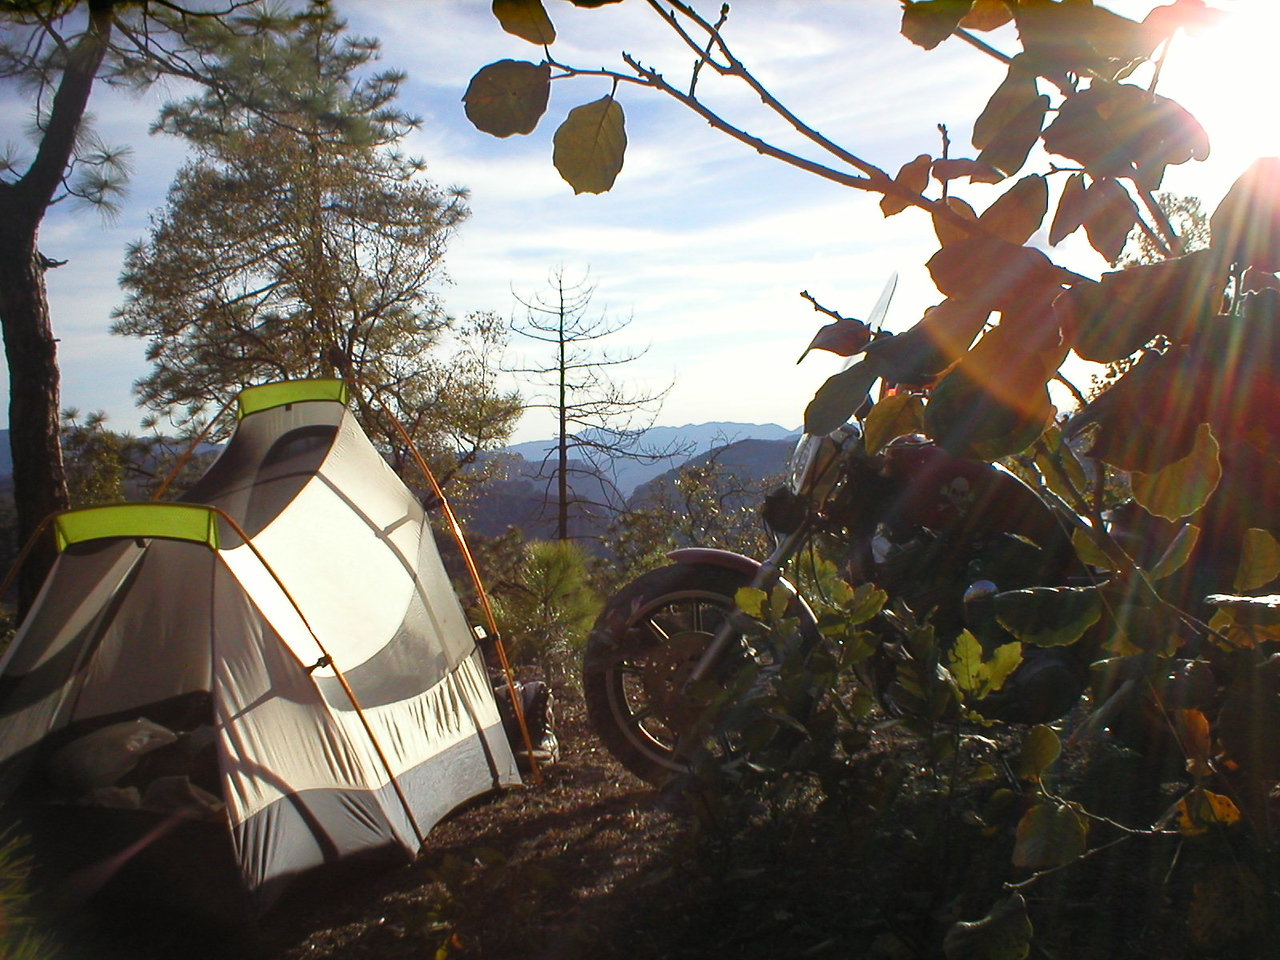 Best camp spot of the trip